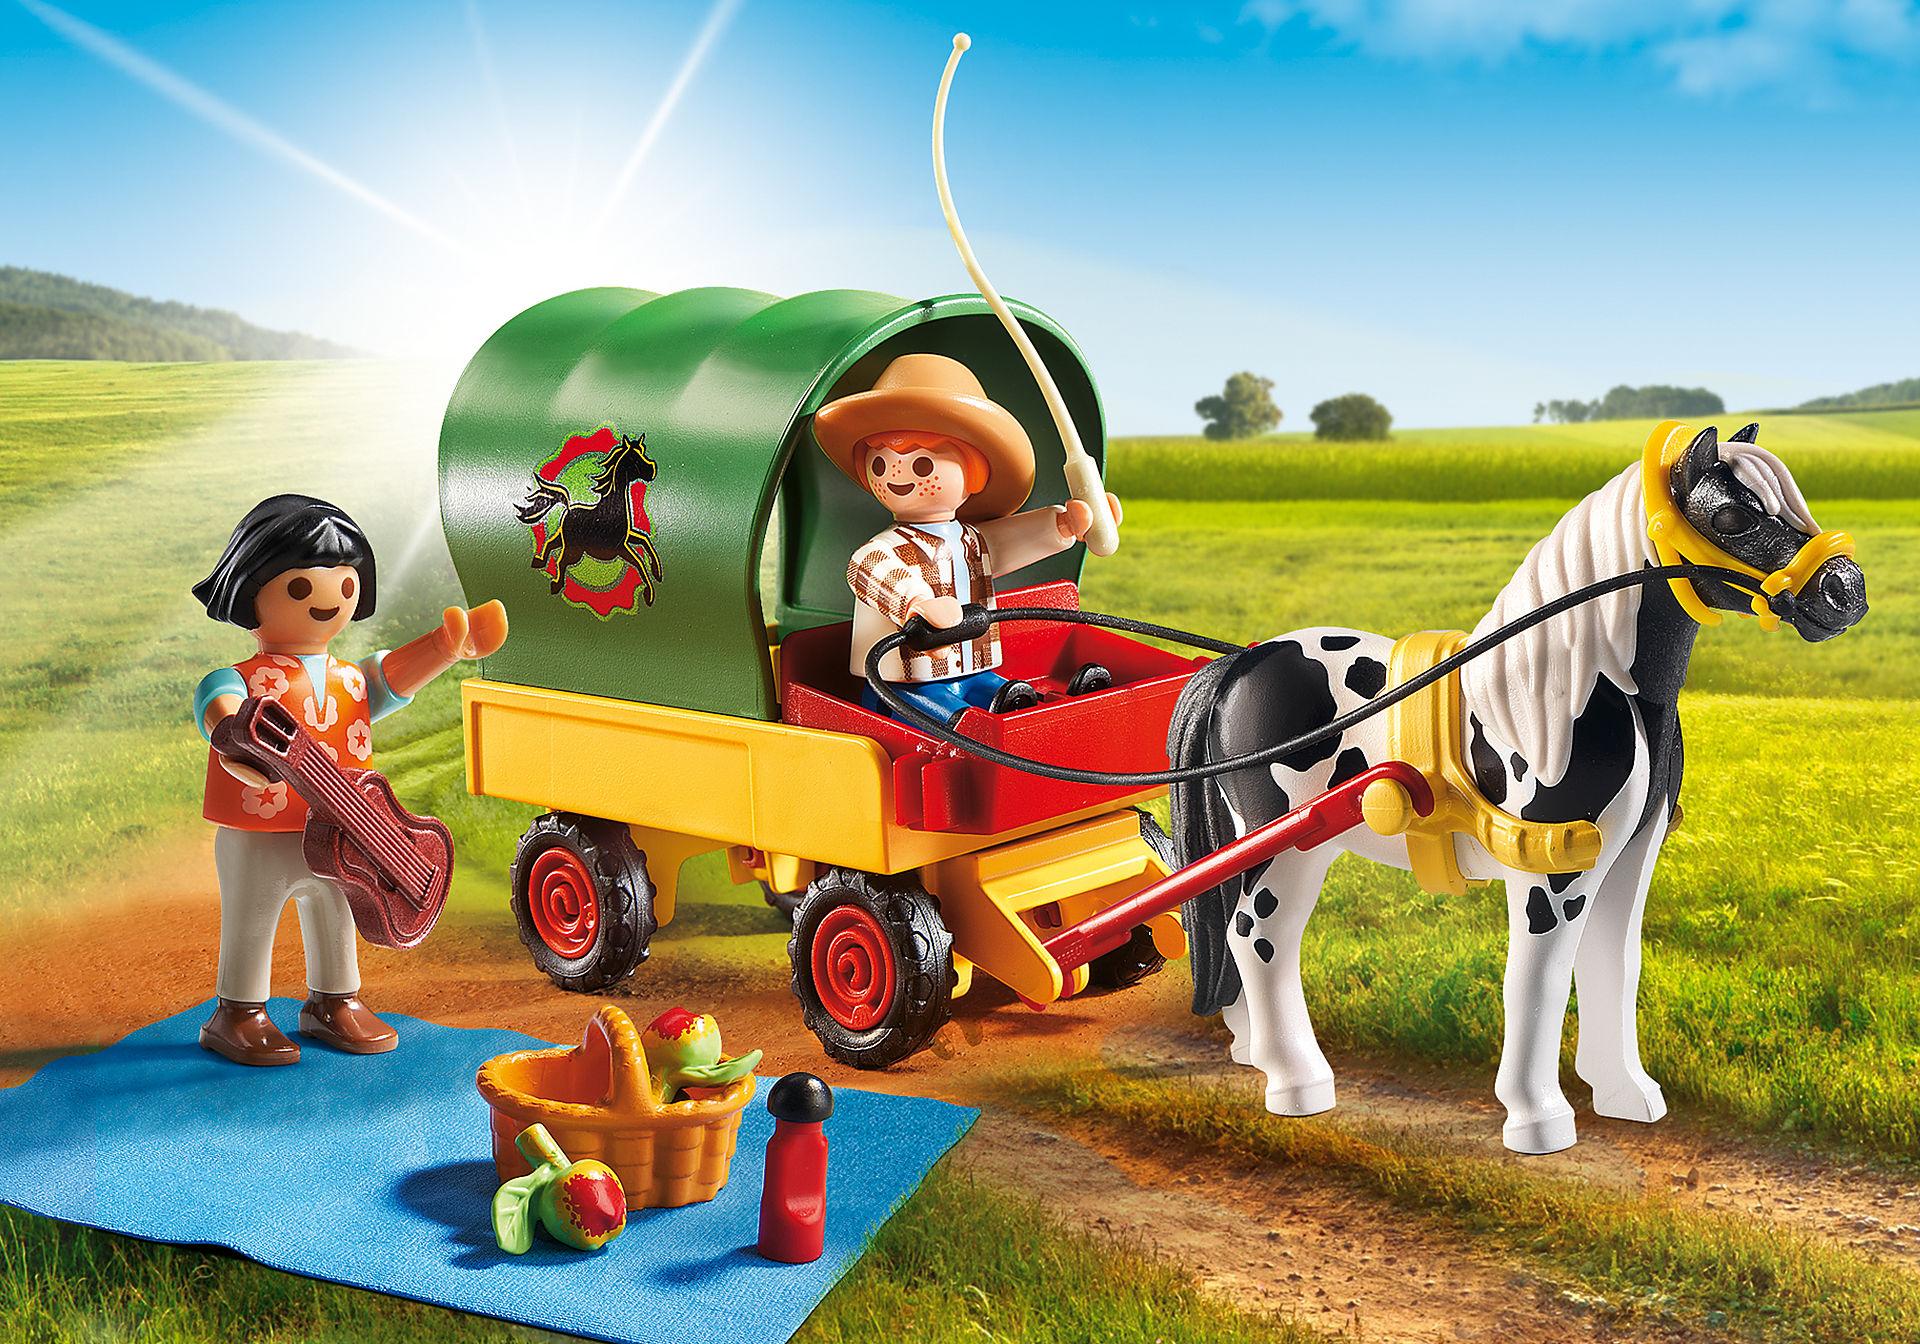 http://media.playmobil.com/i/playmobil/6948_product_detail/Enfants avec chariot et poney